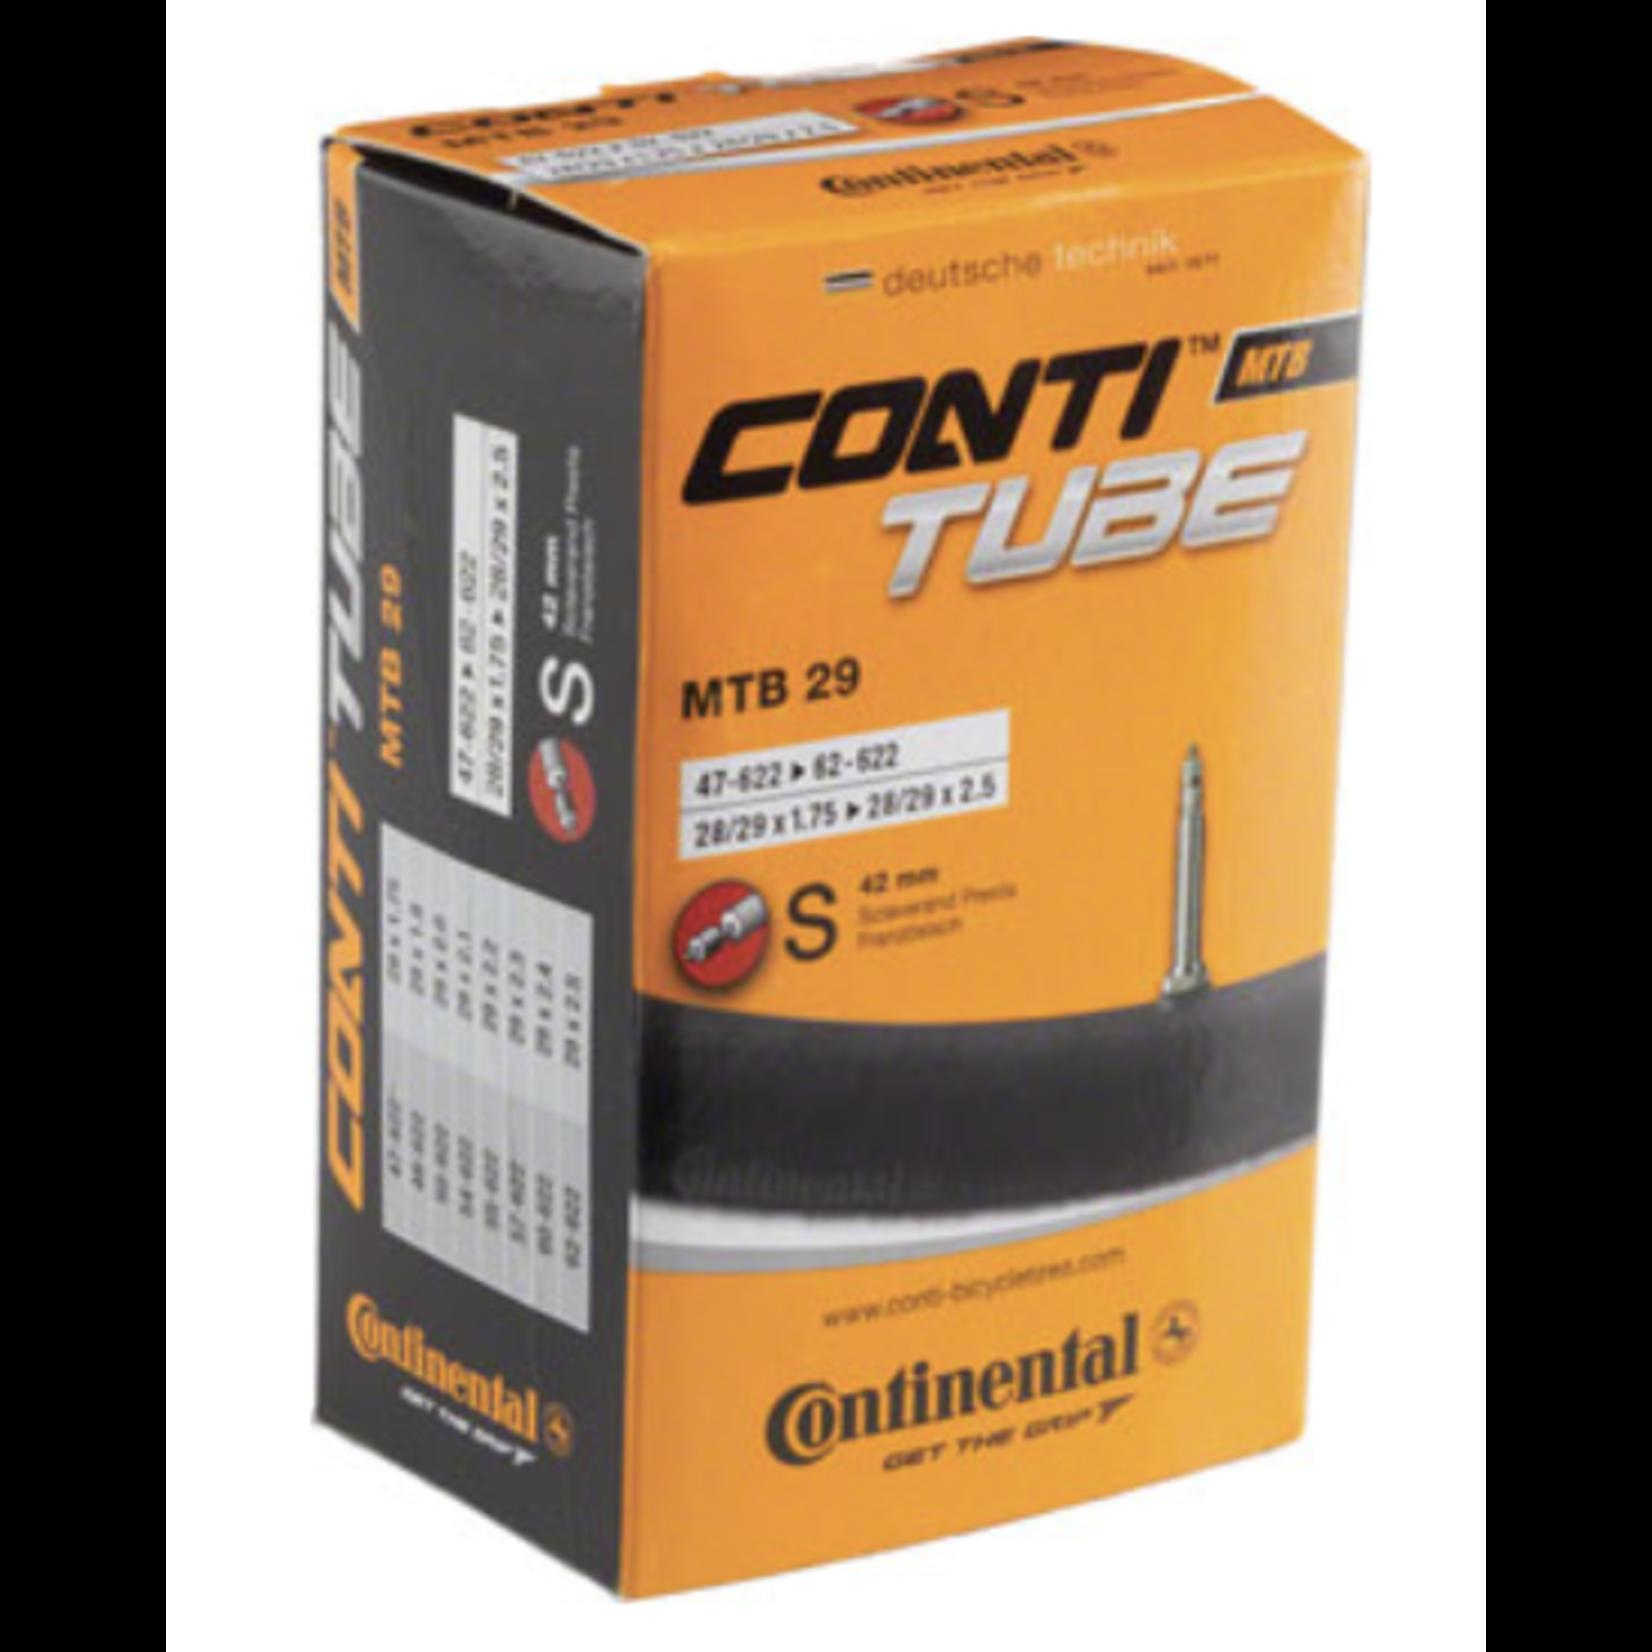 Conti Tube MTB 29 x 1.75 - 2.5